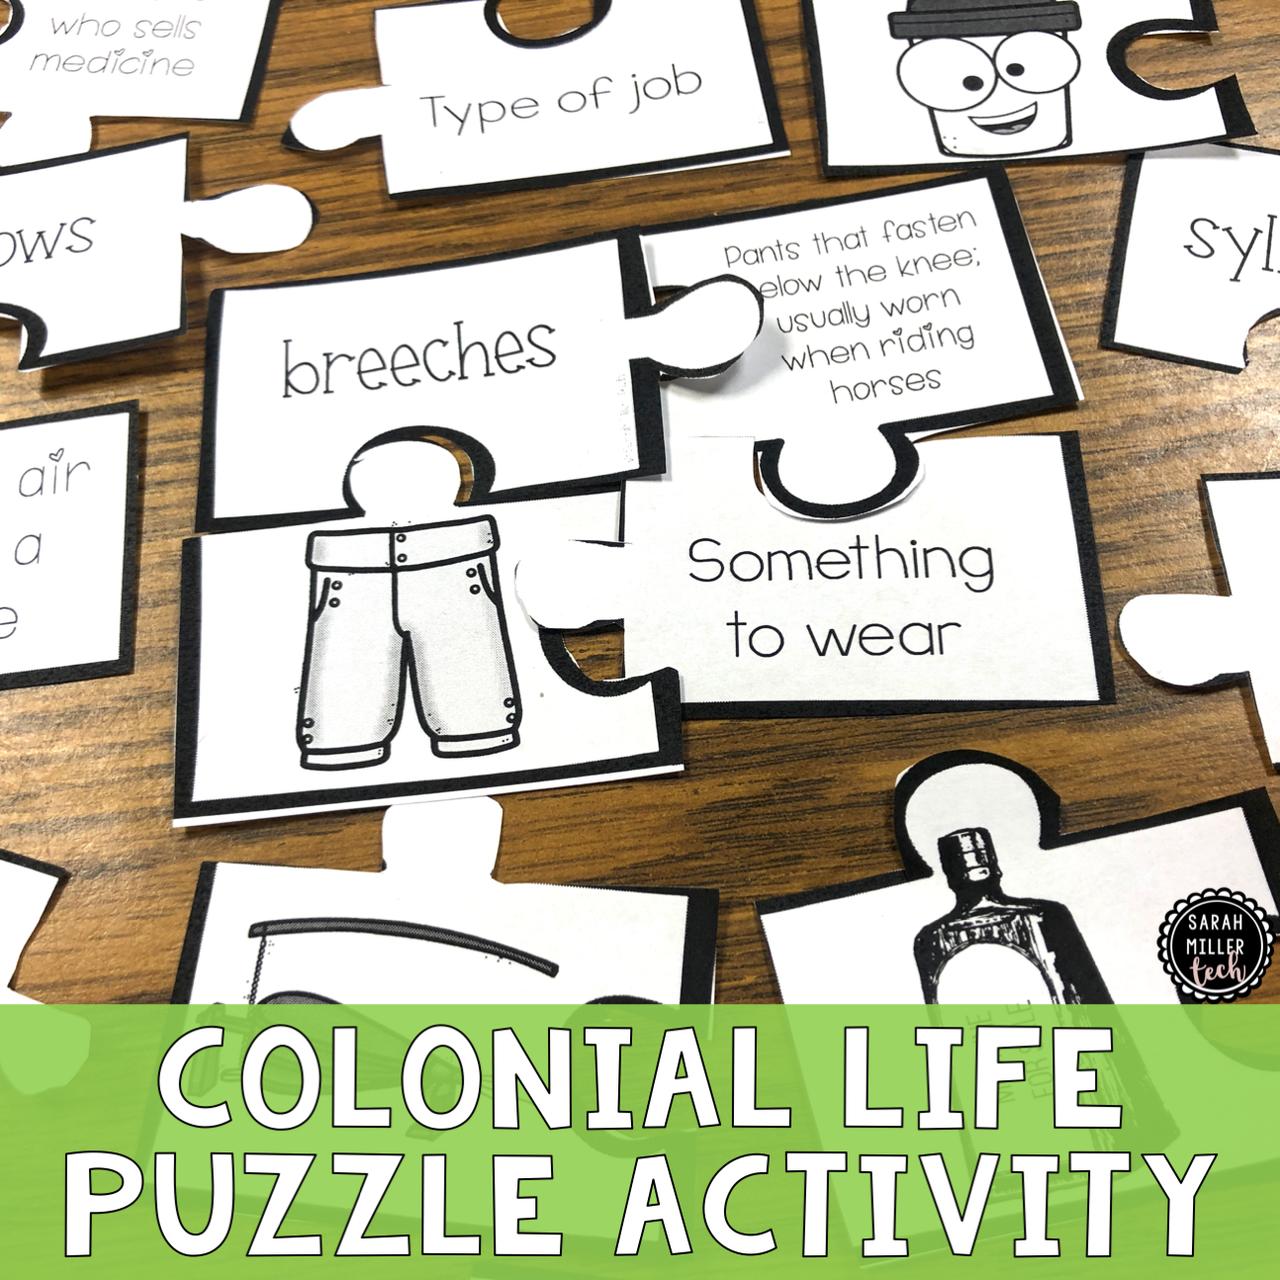 13 Colonies Puzzle Activity